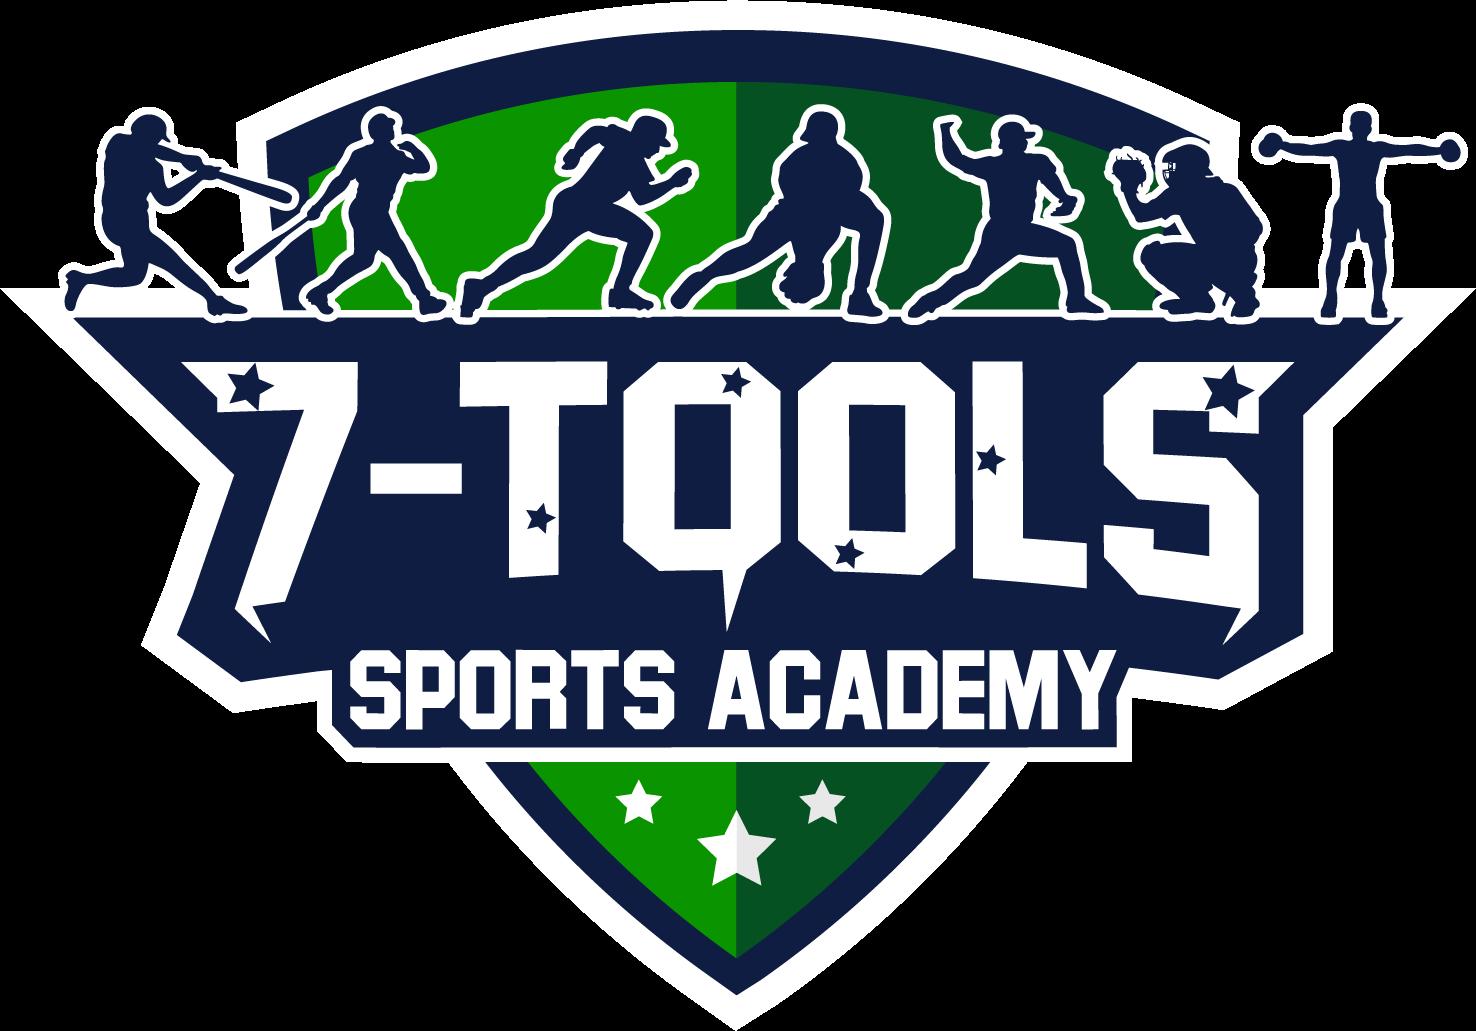 7-tools baseball academy